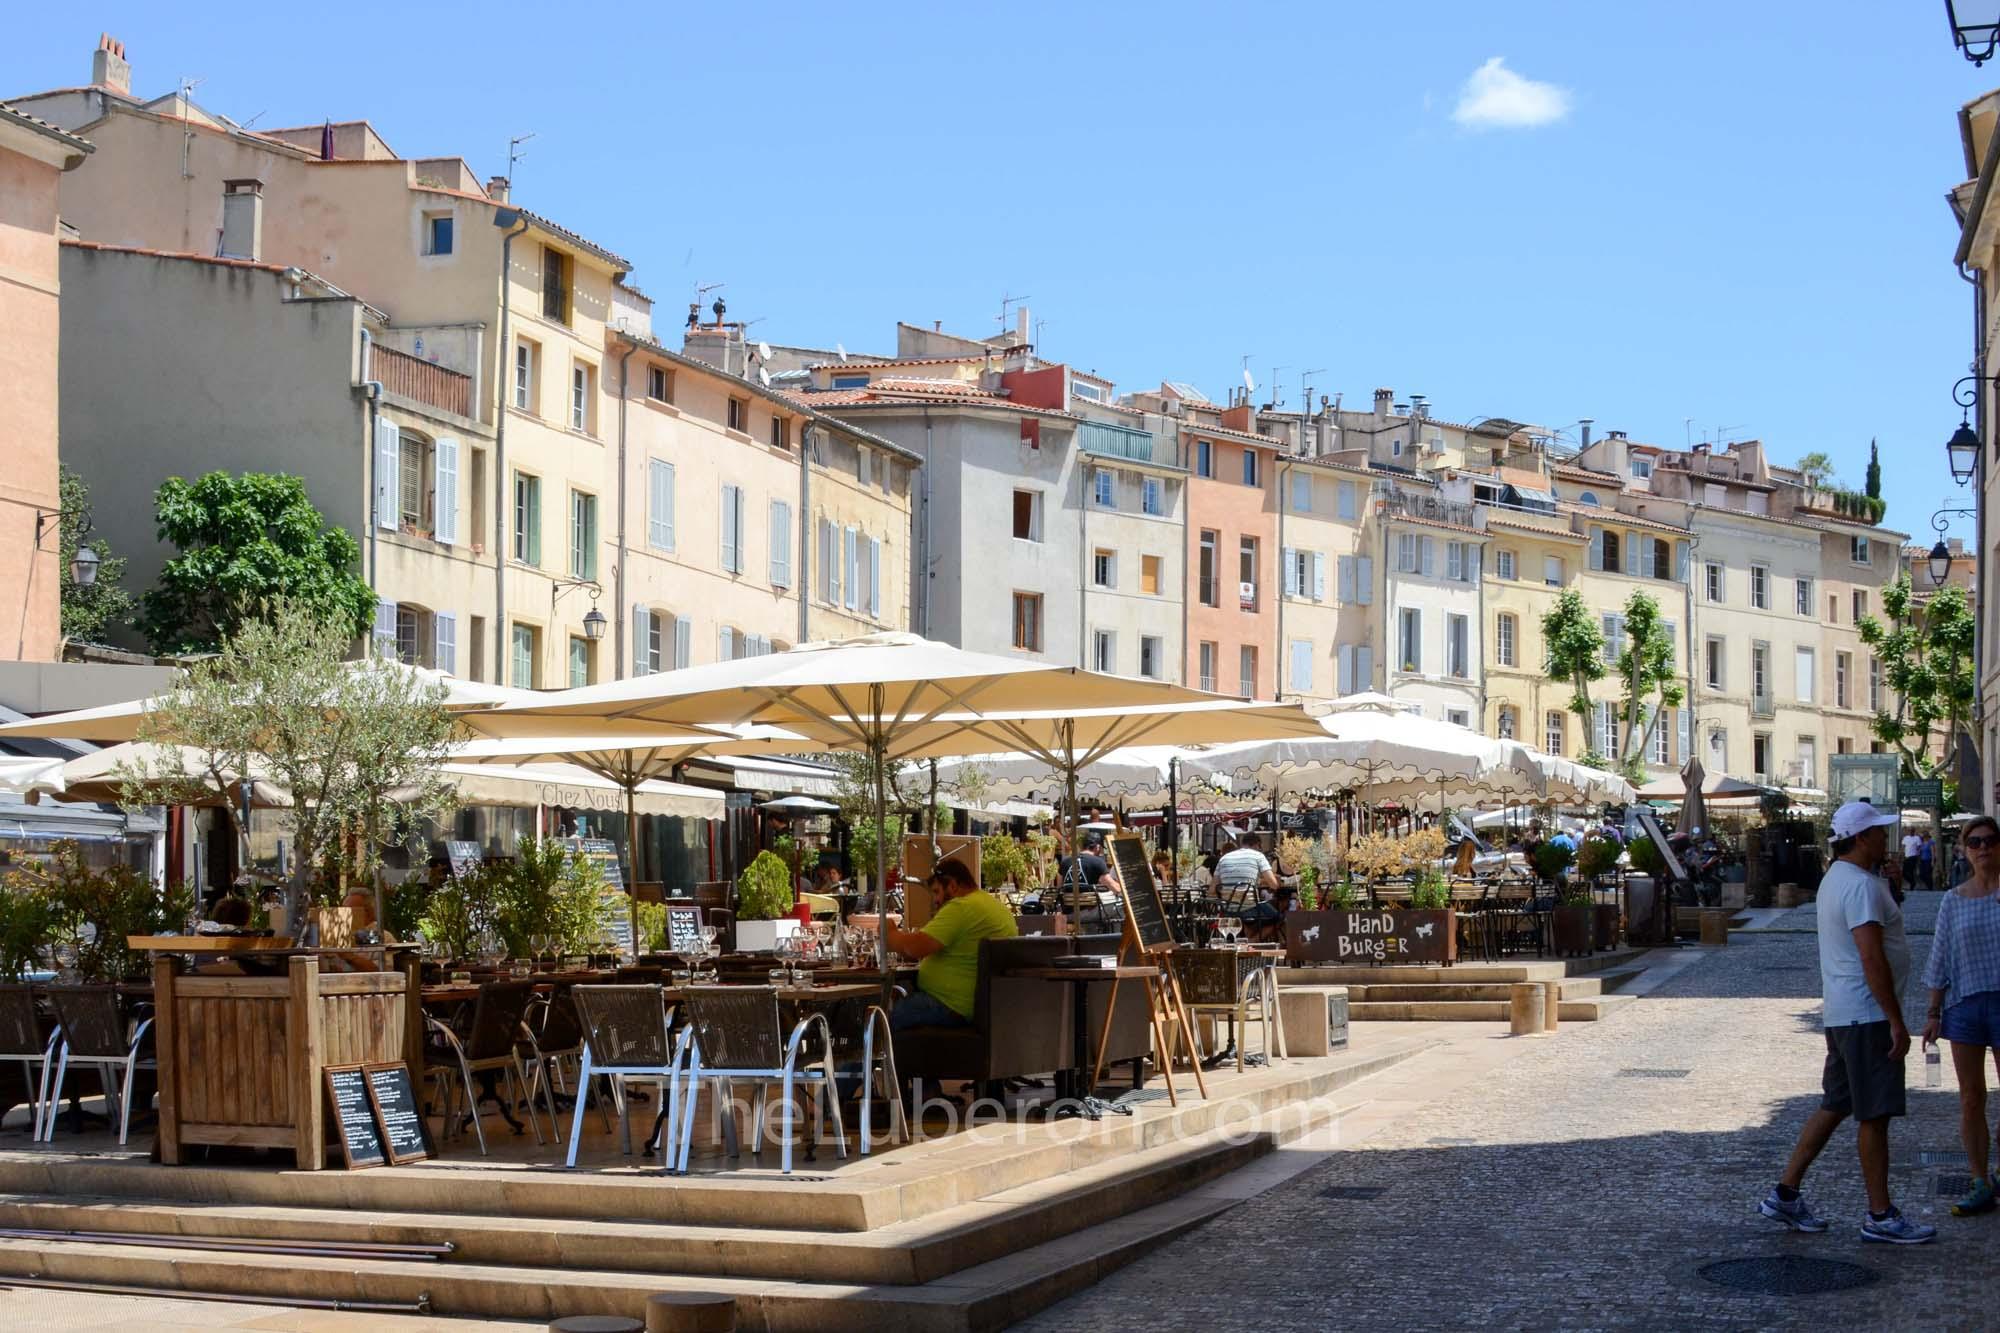 Aix square full of restaurants